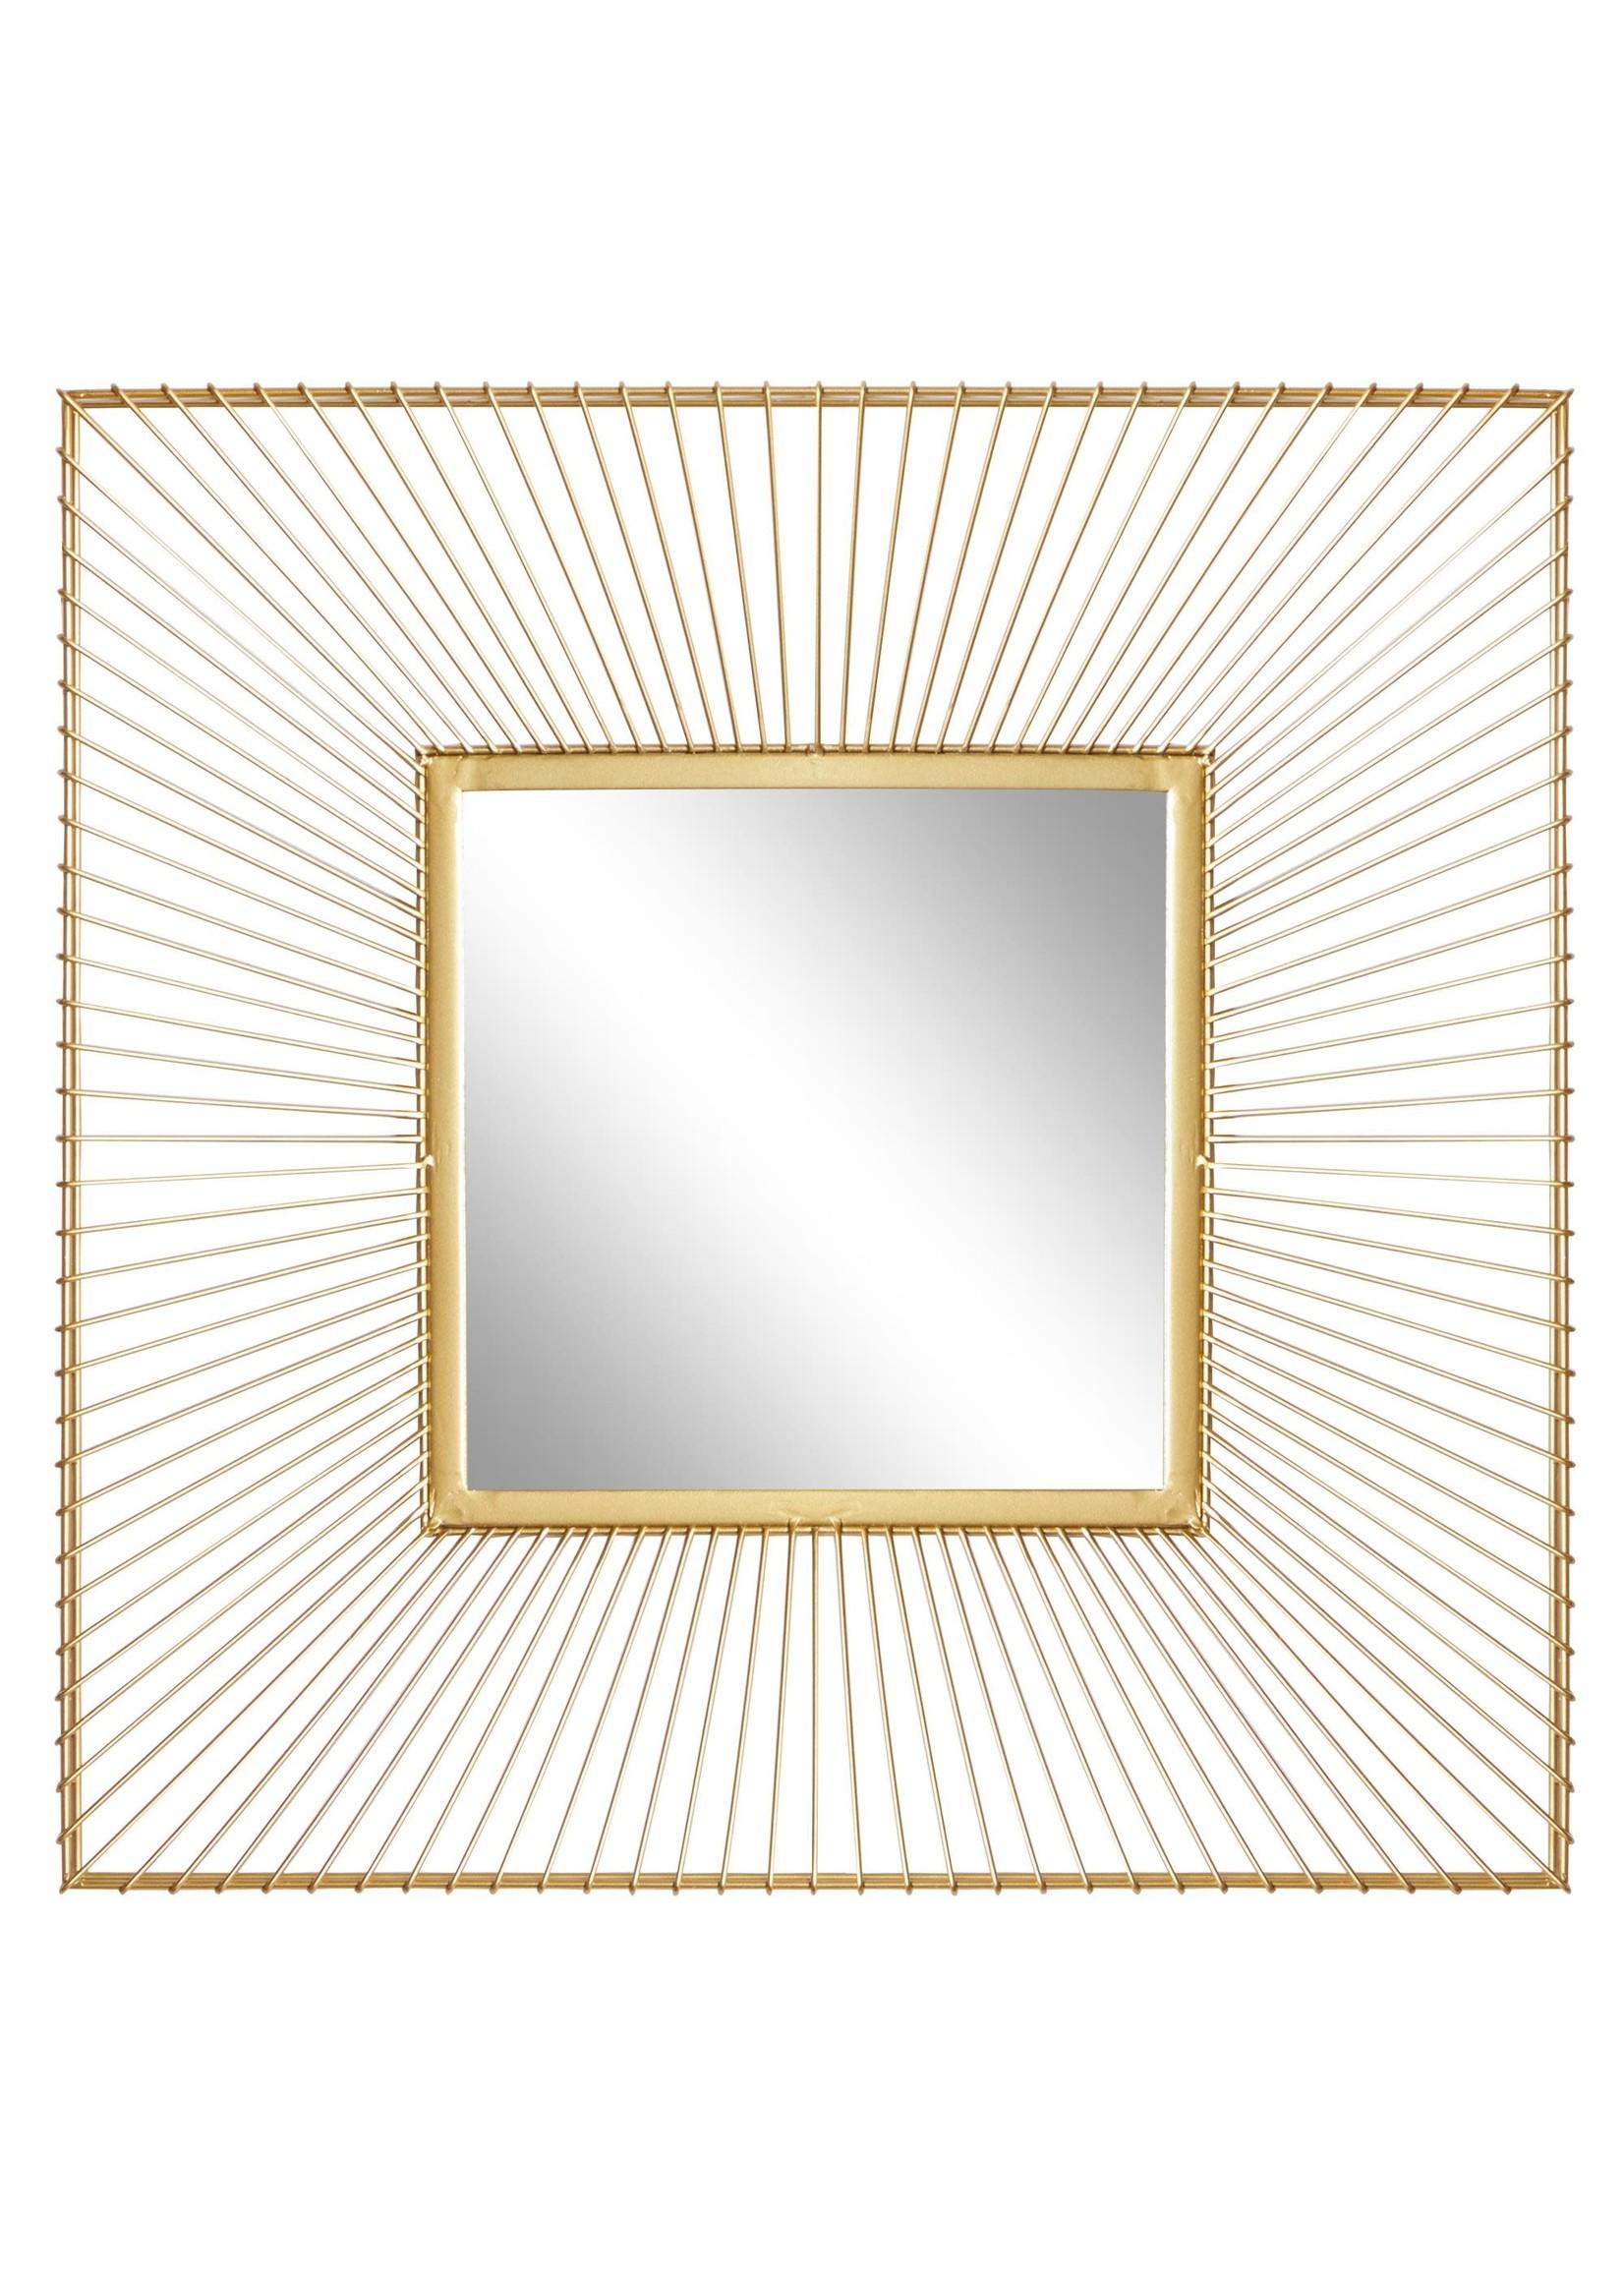 UMA Enterprises Metal Square Wall Mirror Gold